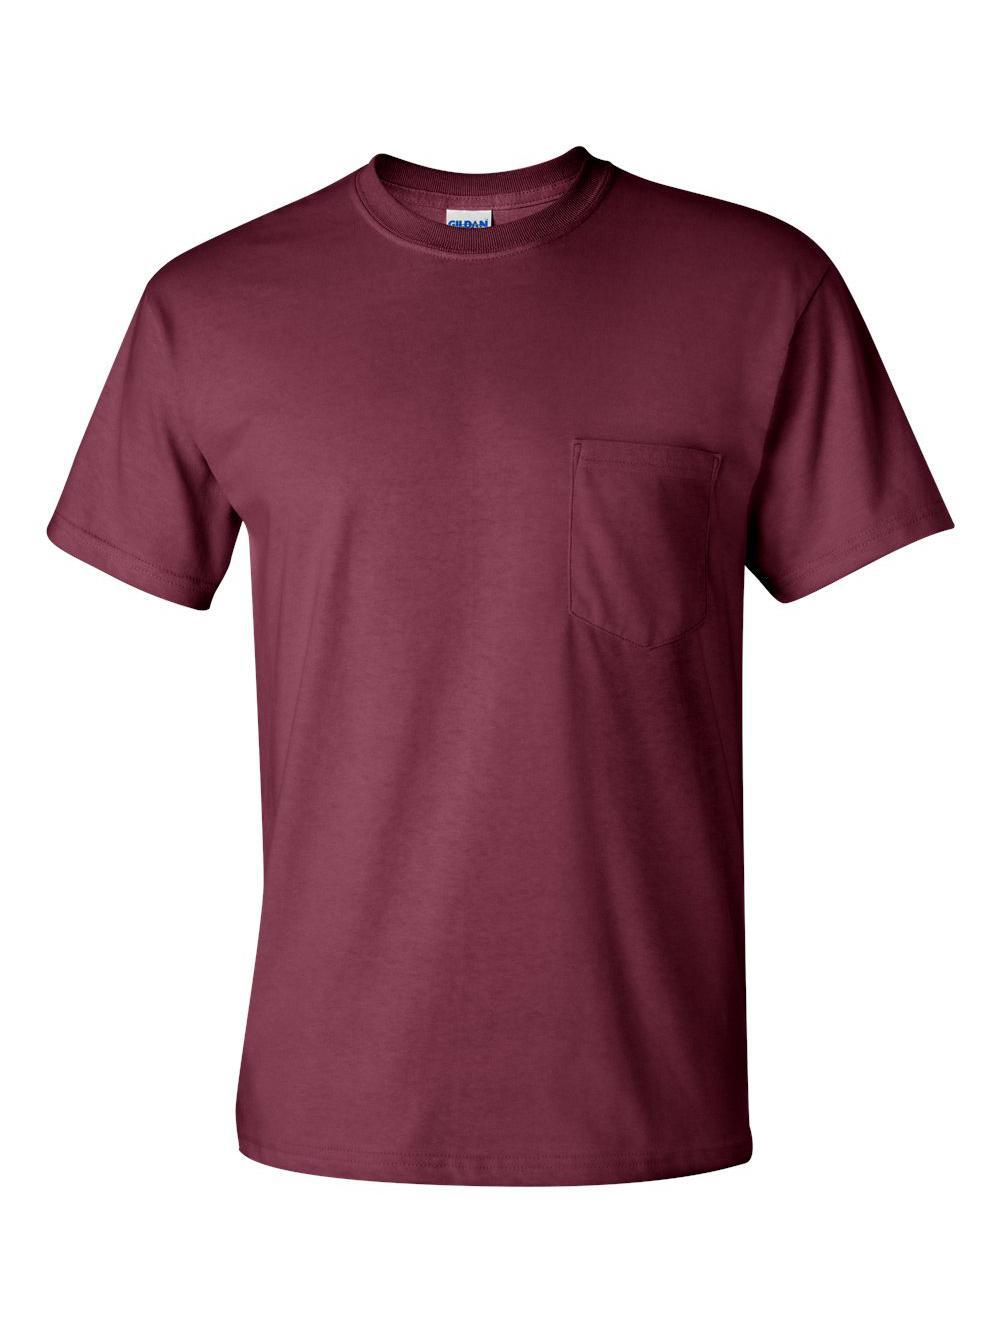 Gildan-Ultra-Cotton-T-Shirt-with-a-Pocket-2300 thumbnail 18